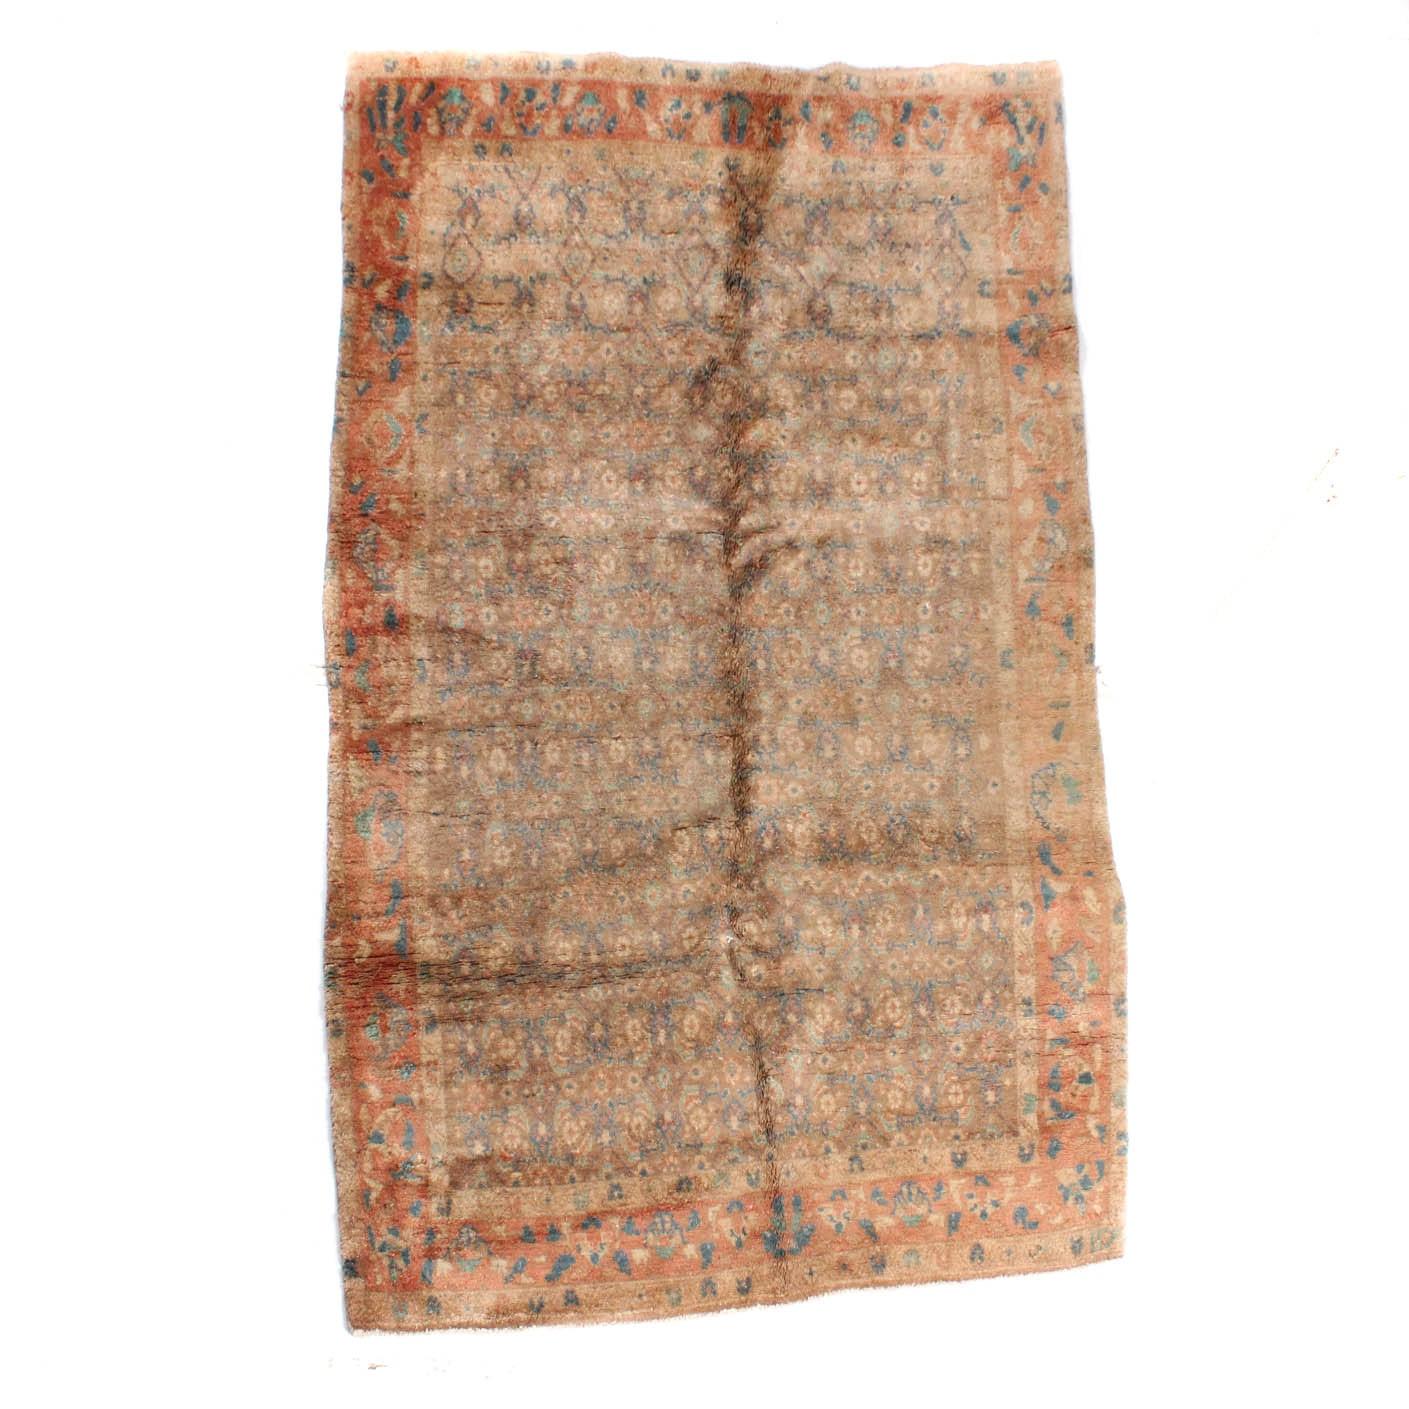 Vintage Hand-Knotted Persian Lilihan Sarouk Area Rug